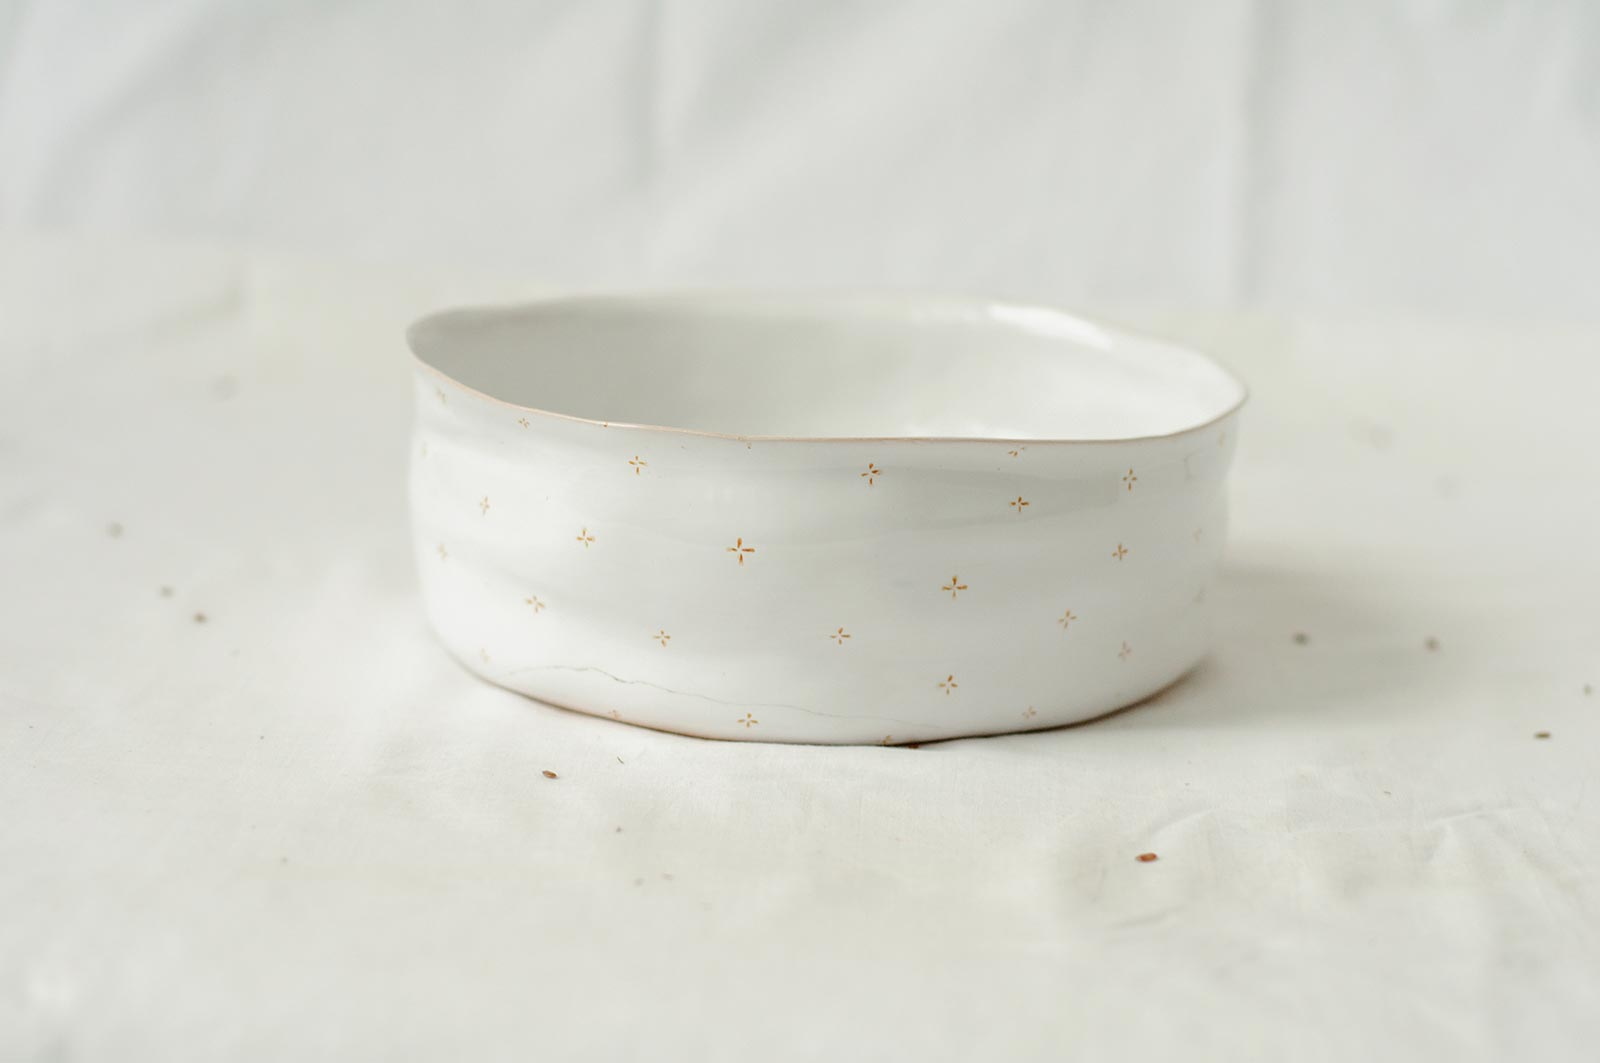 Side view - Big deep plate from ceramics (Handmade)